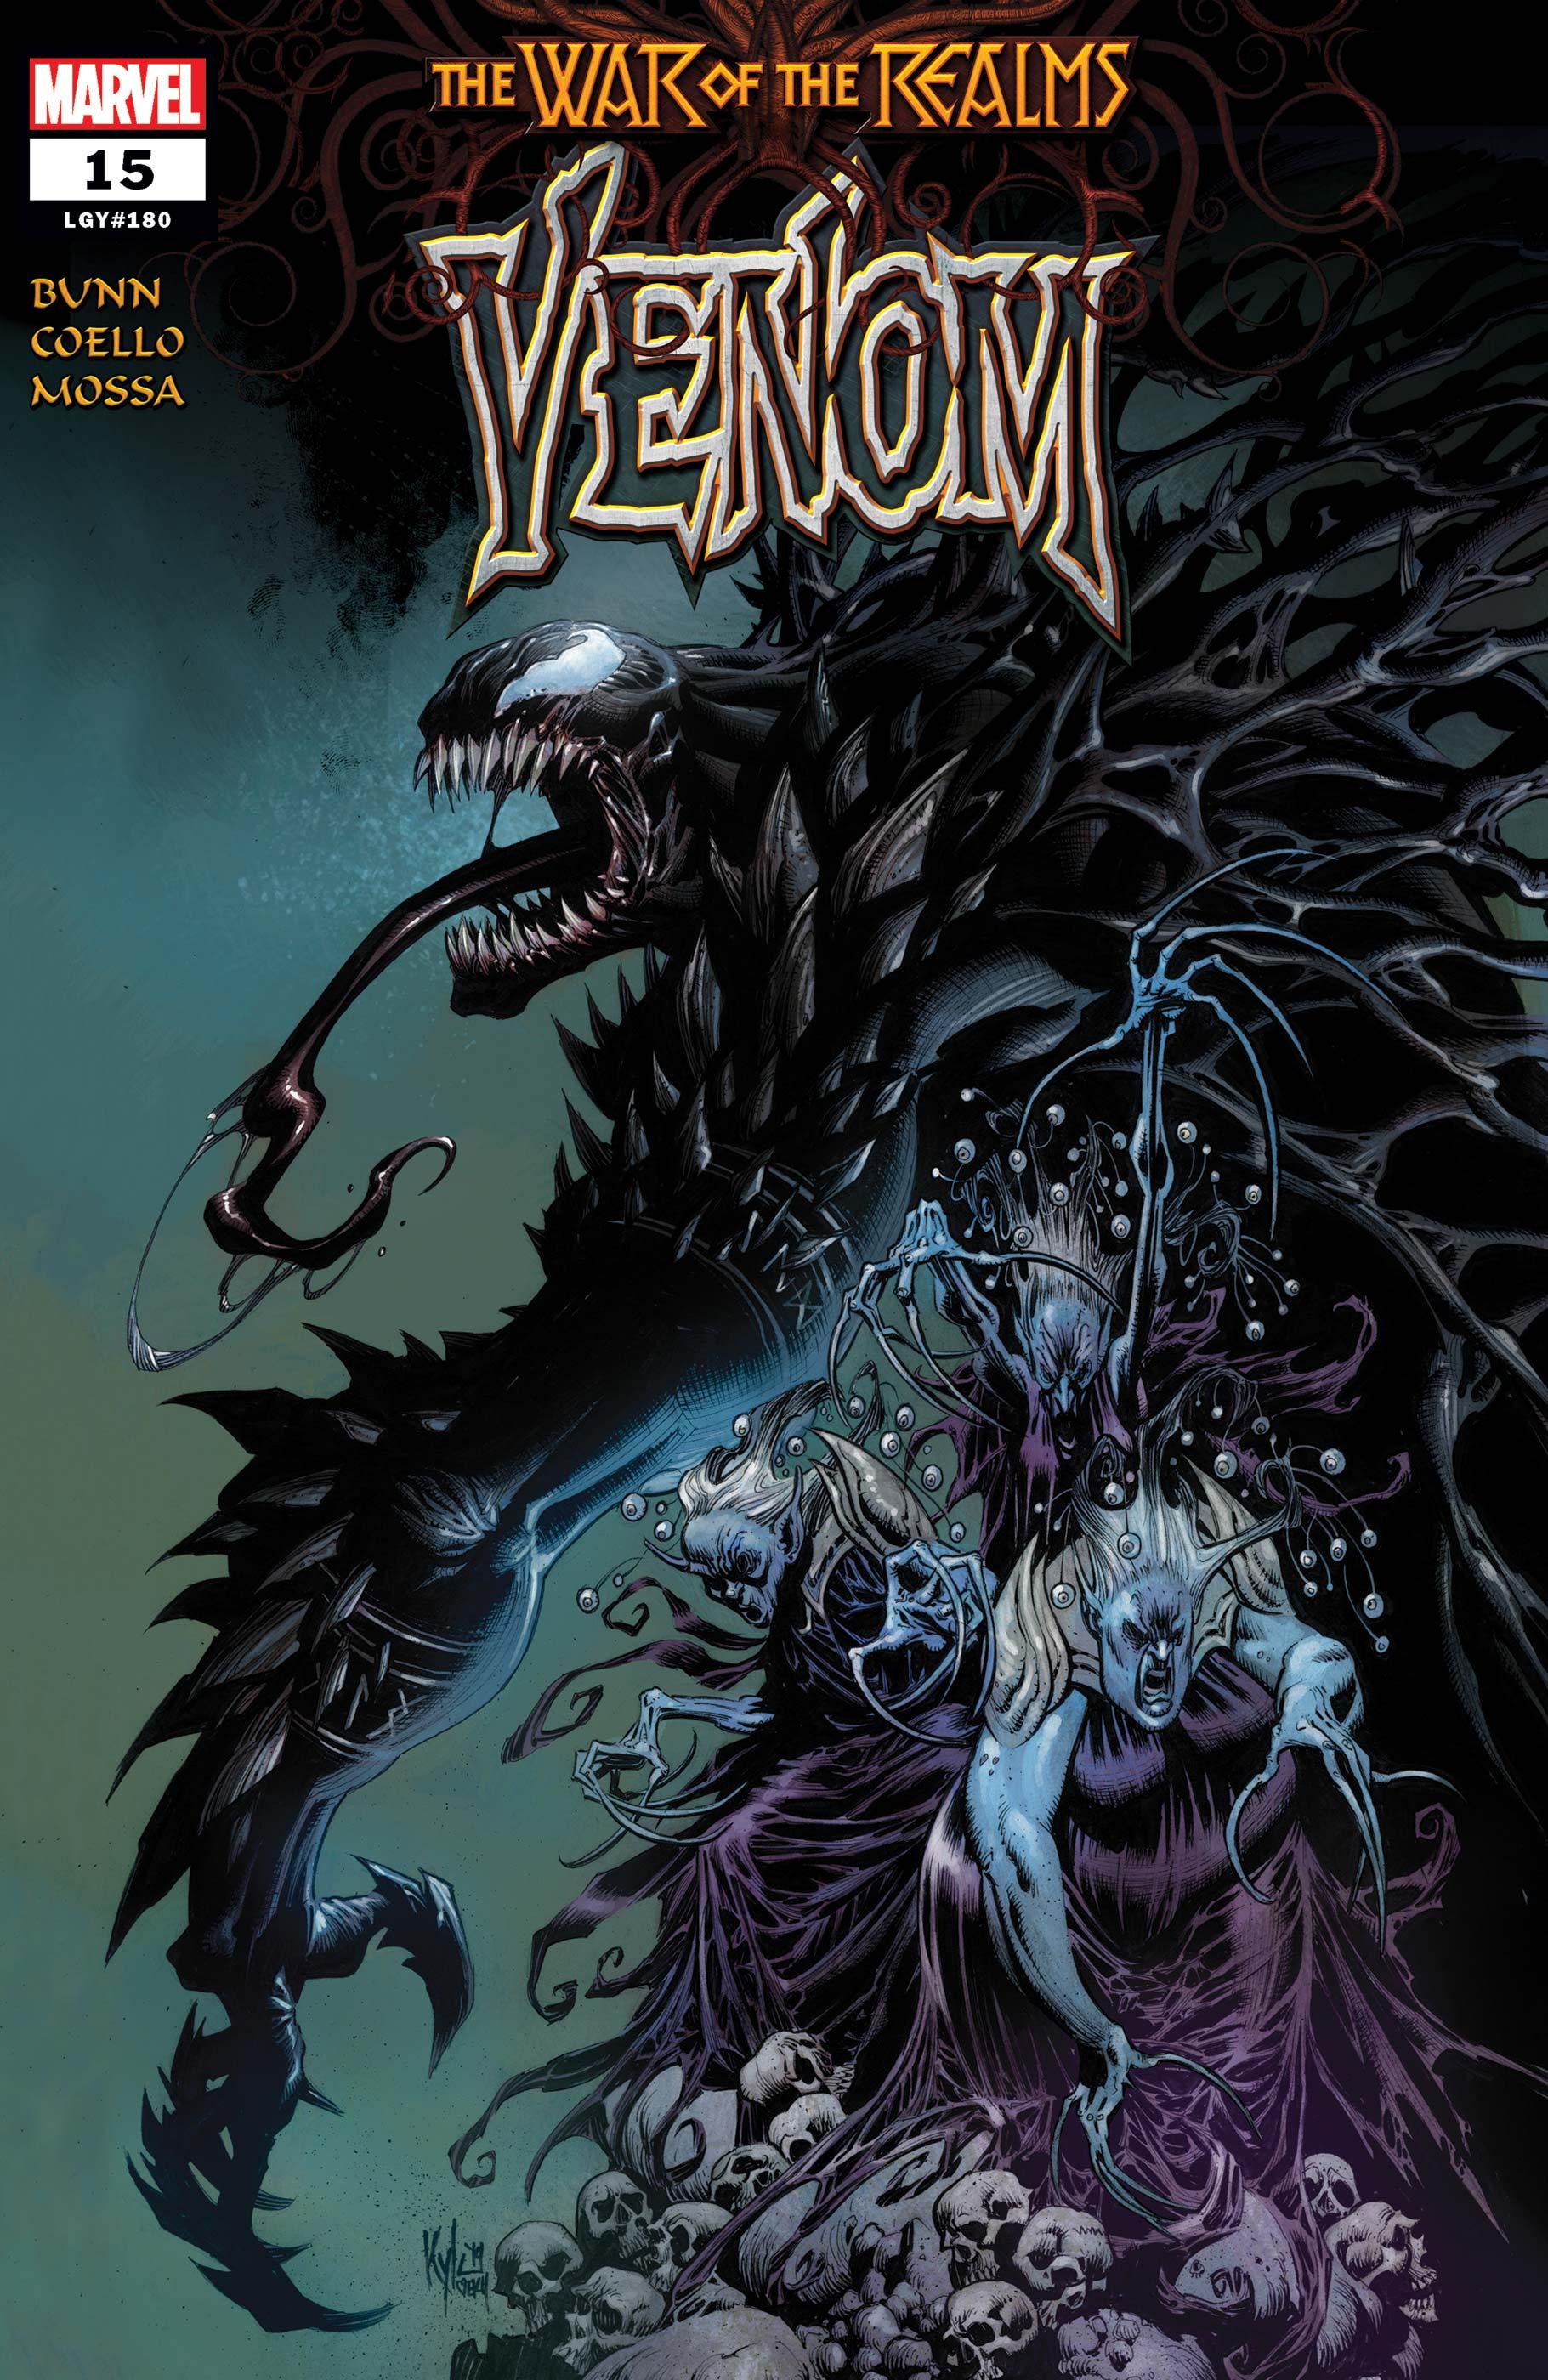 Venom (2018) #15